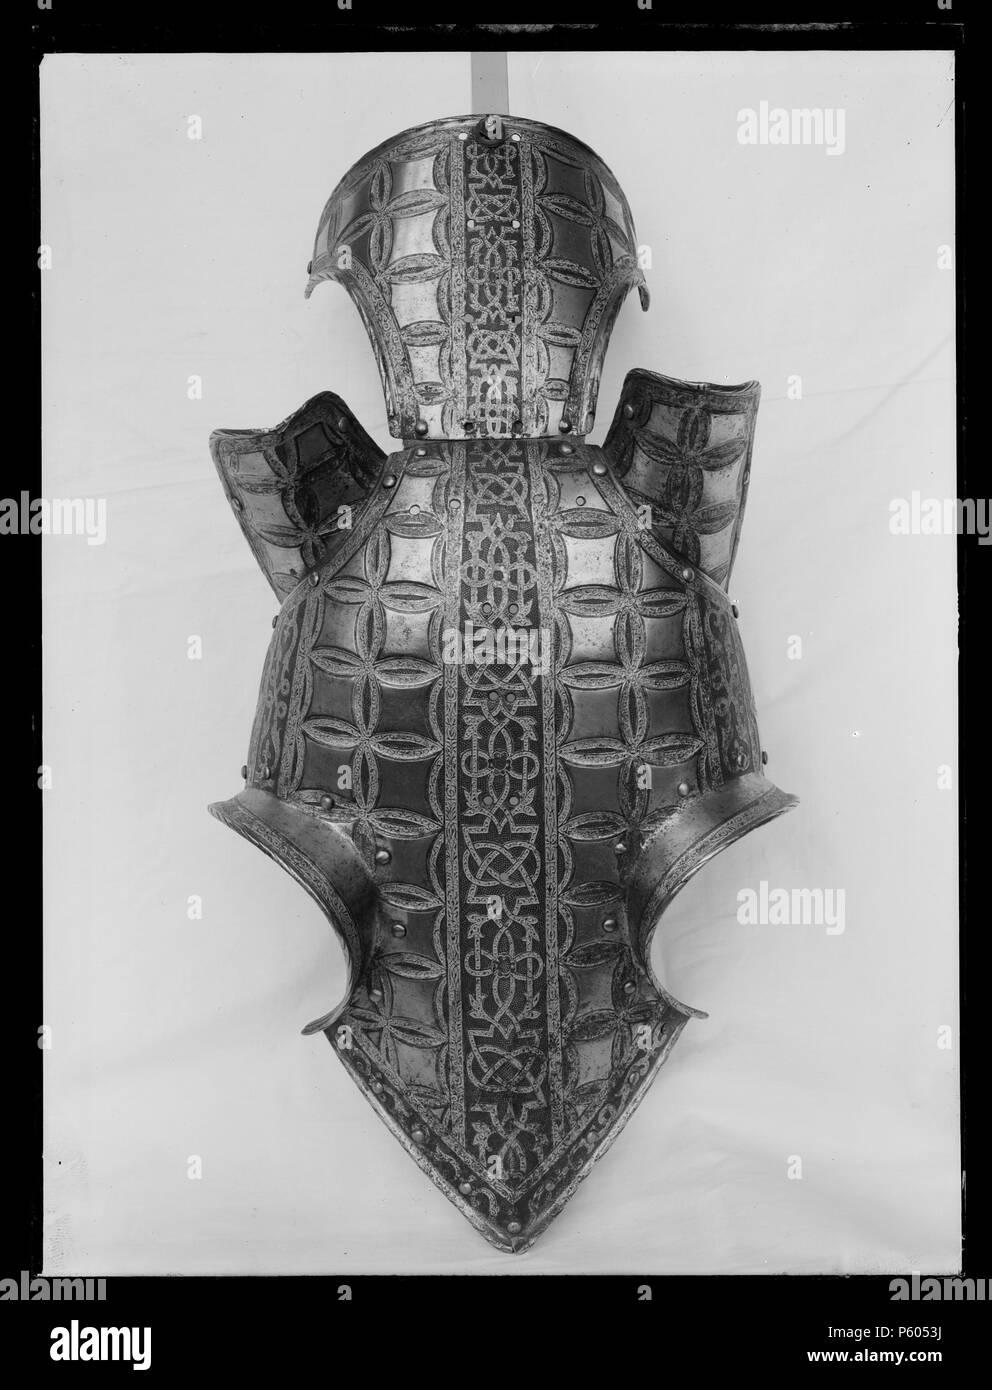 hastighet dating Cotes d Armor